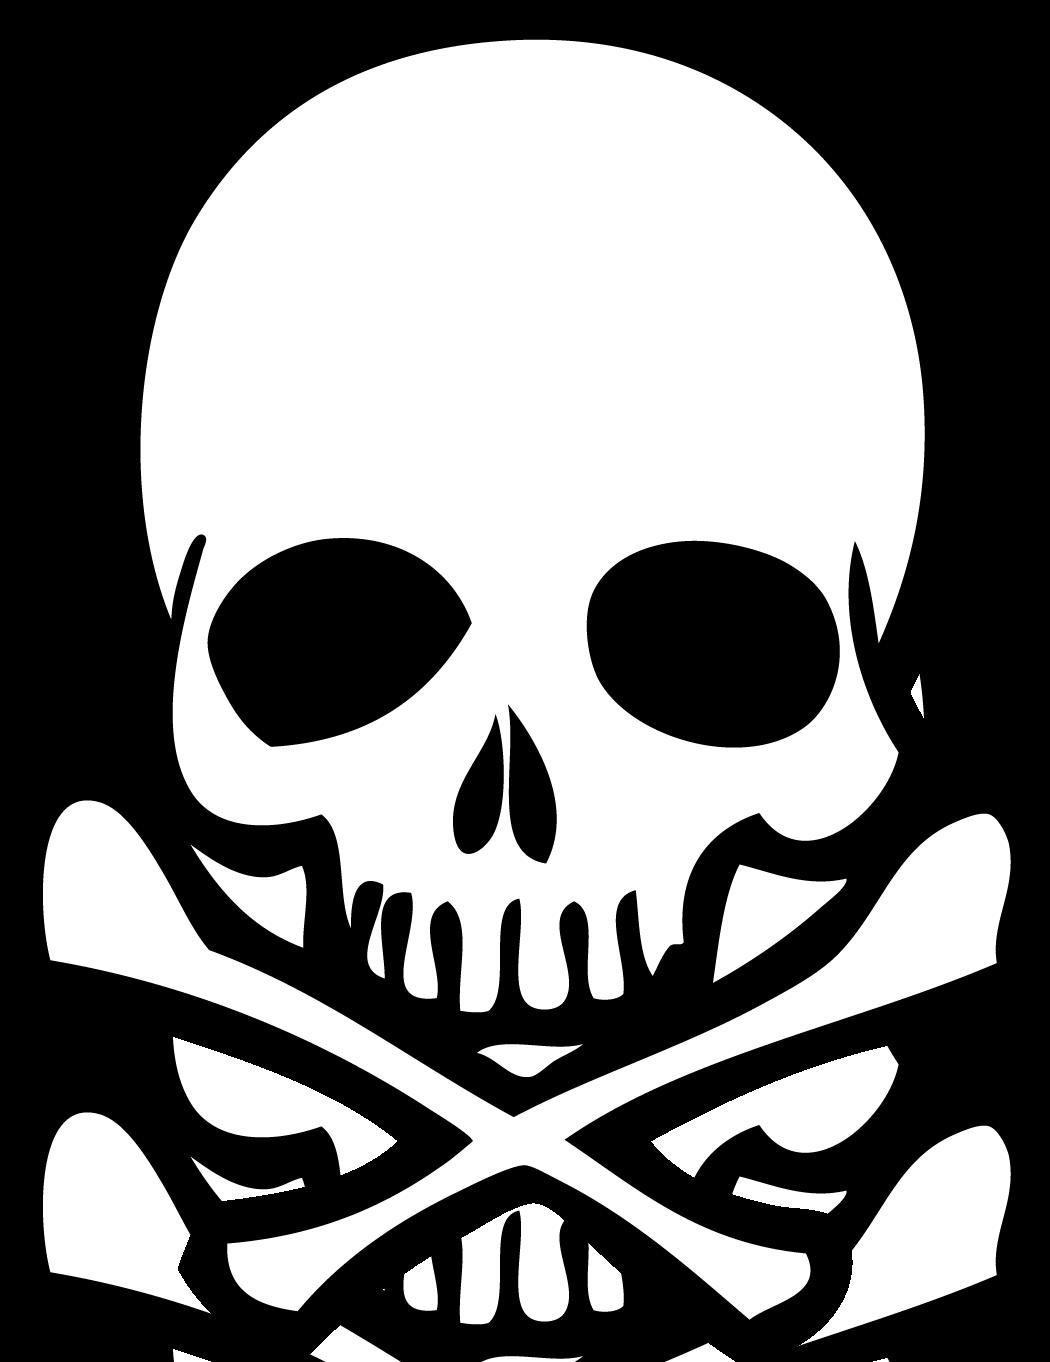 Clipart skull and bones - .